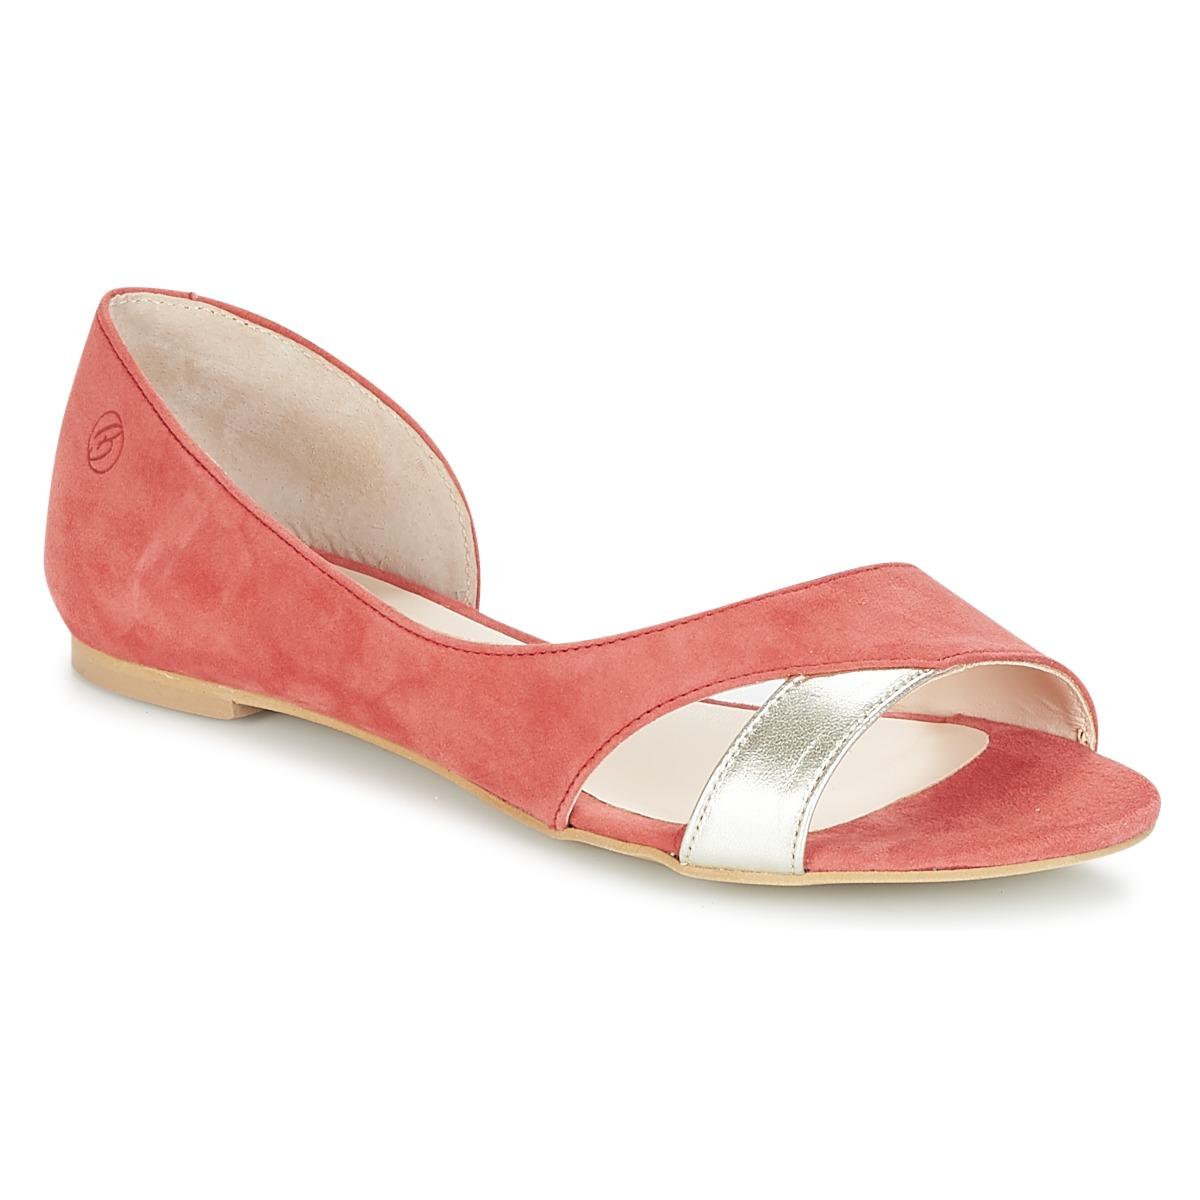 Betty London GRETAZ Rot - Kostenloser Versand bei Spartoode ! - Schuhe Sandalen / Sandaletten Damen 51,99 €